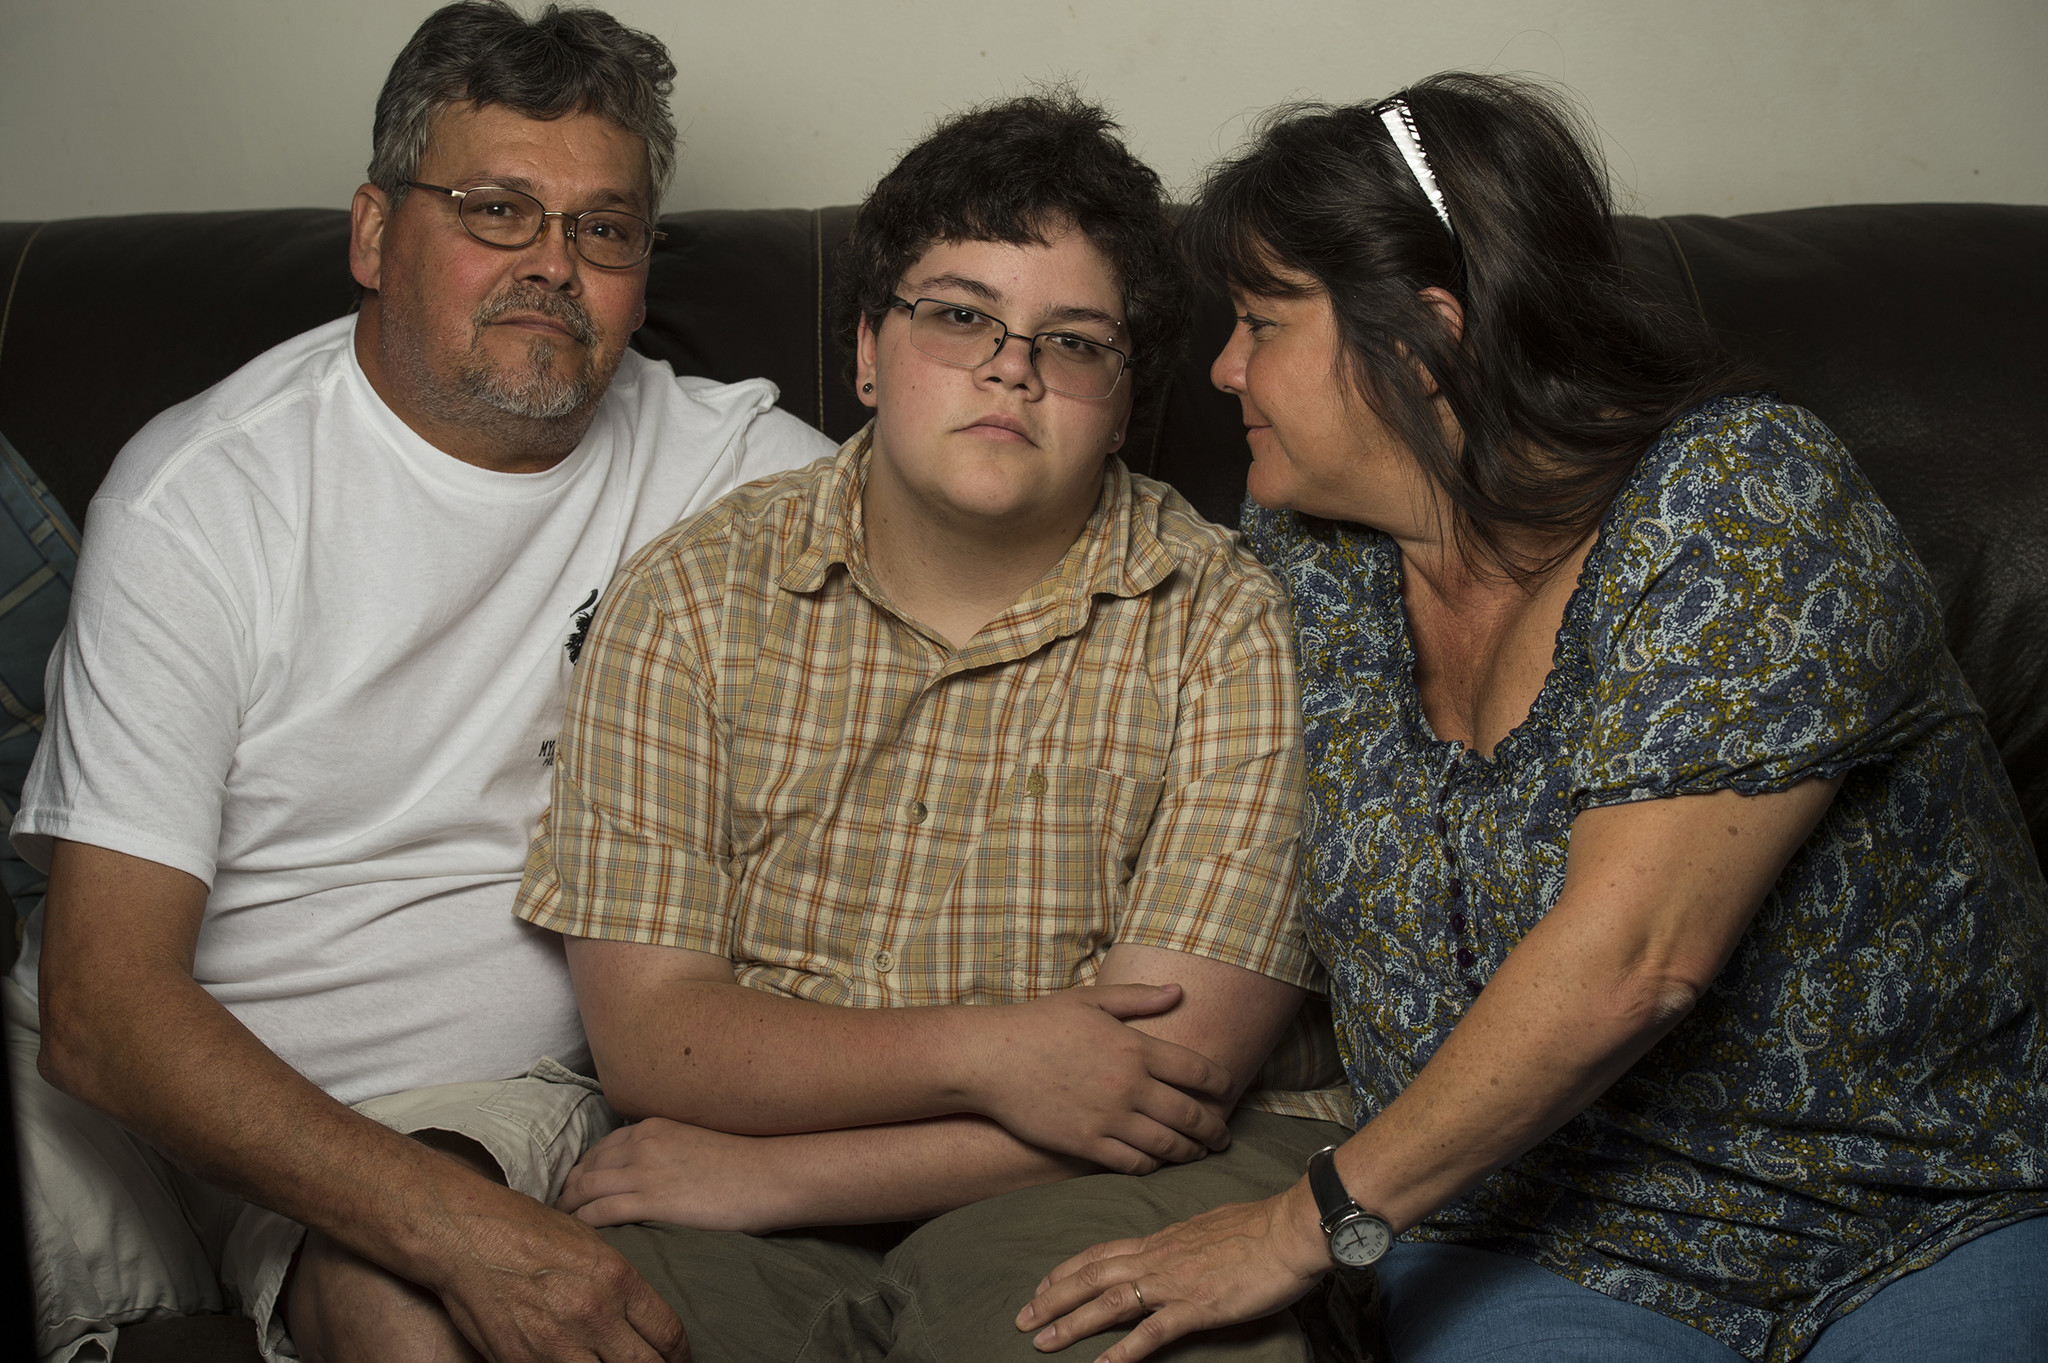 Schools, parents left without answers after Supreme Court passes on transgender bathroom case